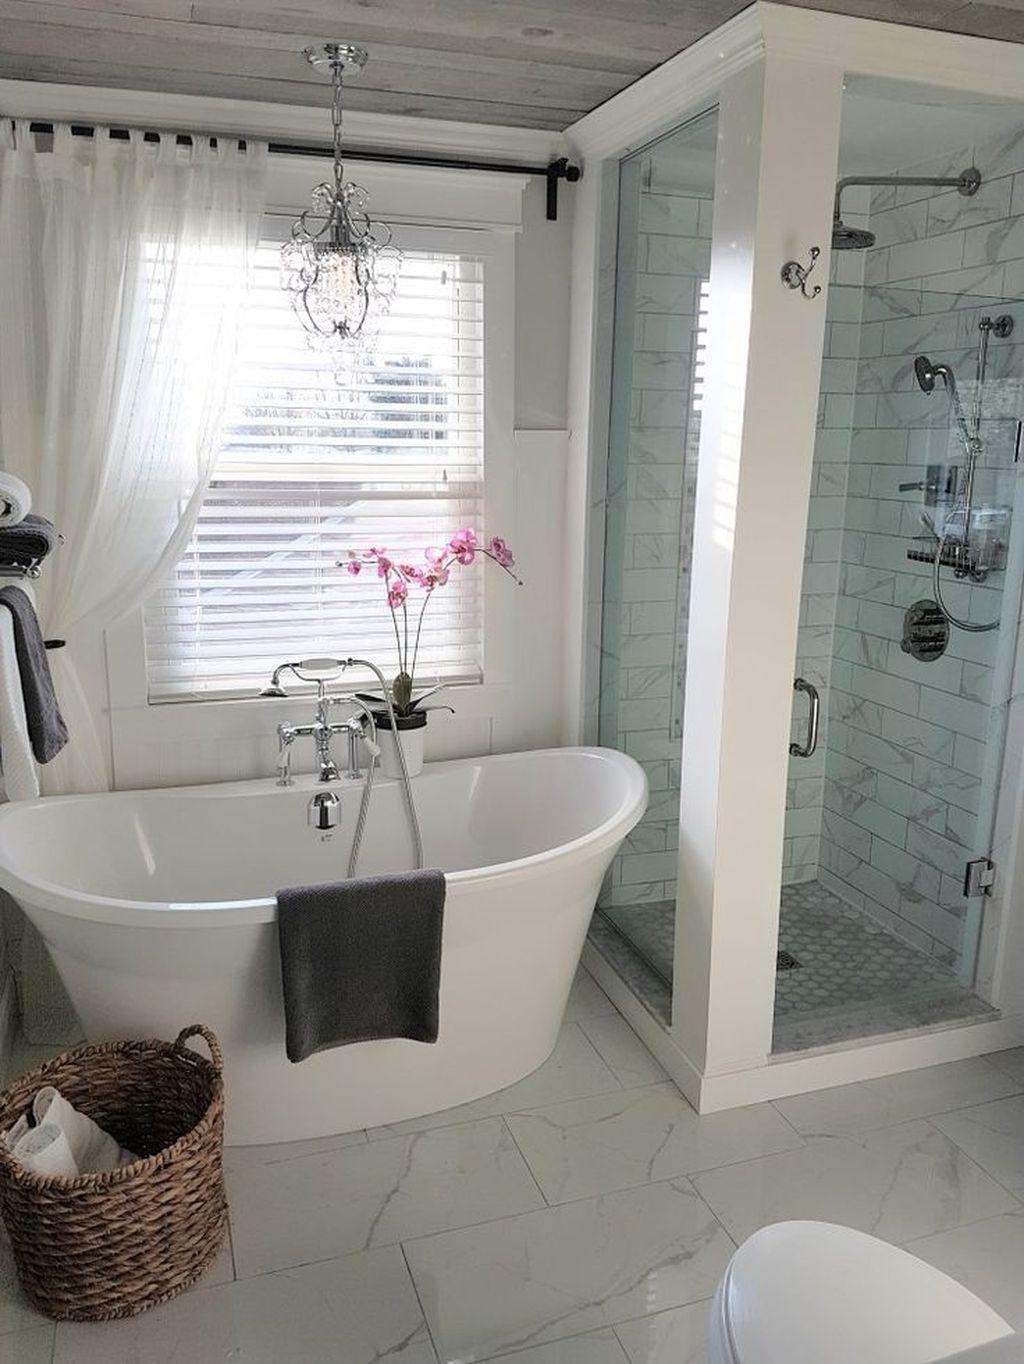 48 Classy Small Bathroom Ideas